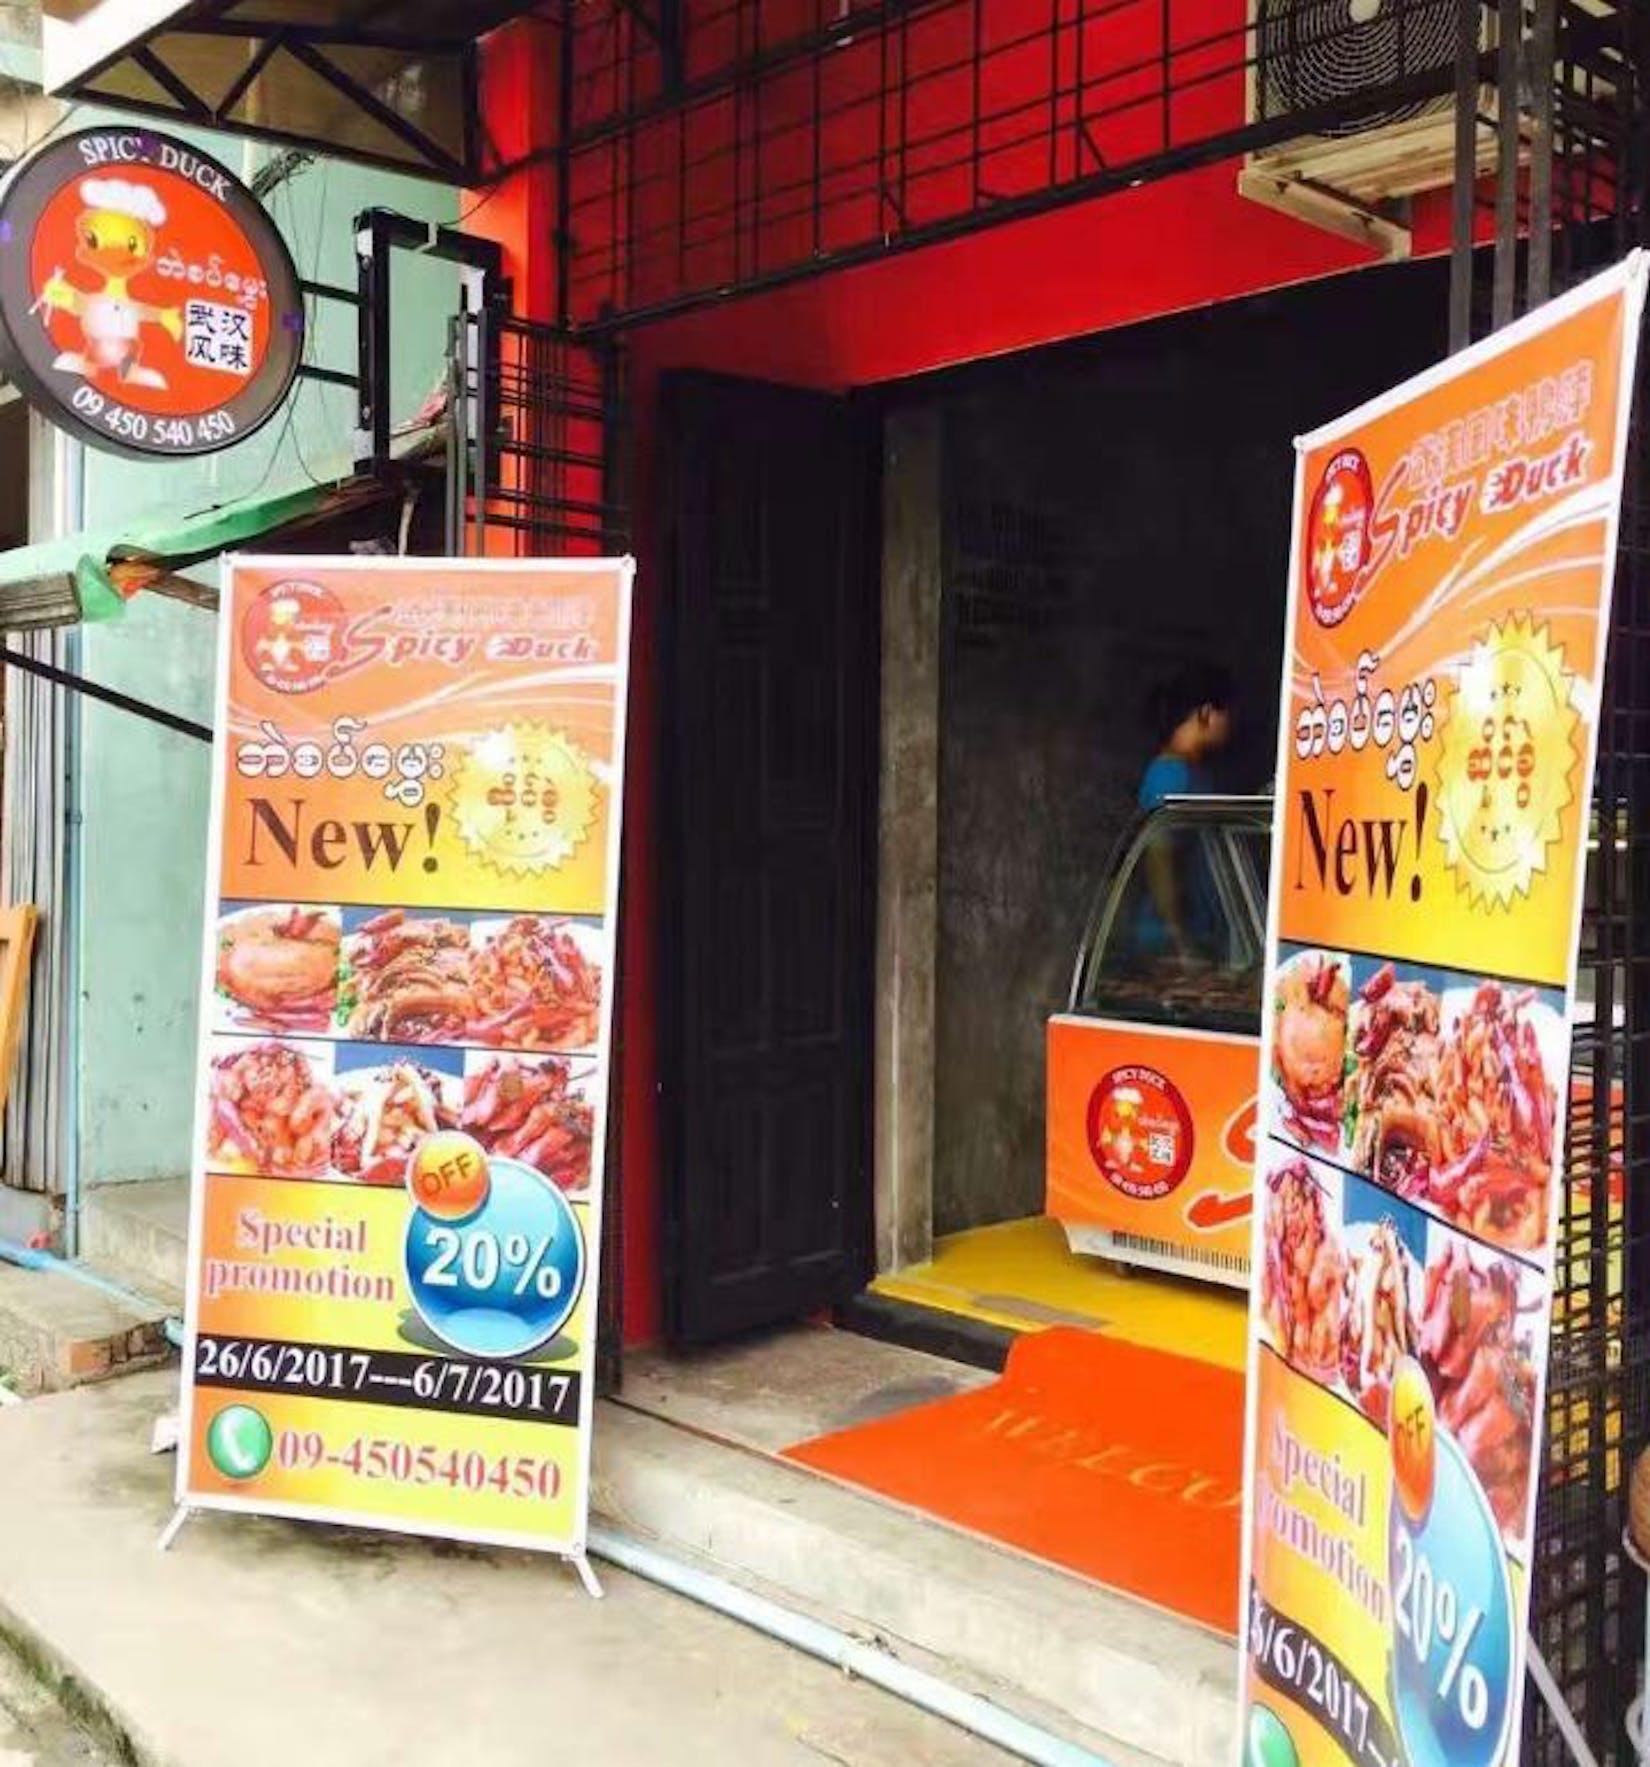 武汉风味鸭脖(第四店)Spicy Duck Yuzana Plaza | yathar